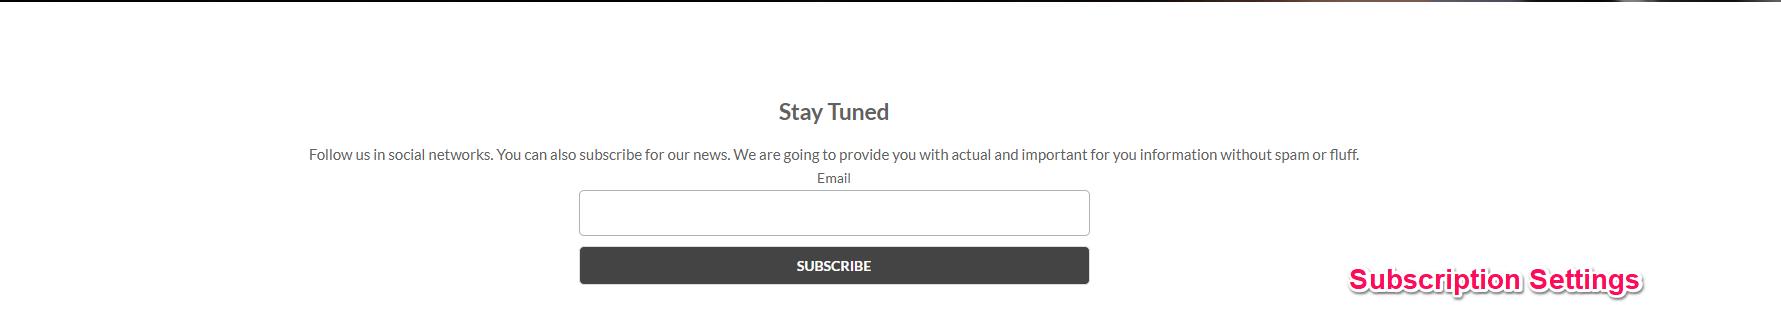 Subscription Settings